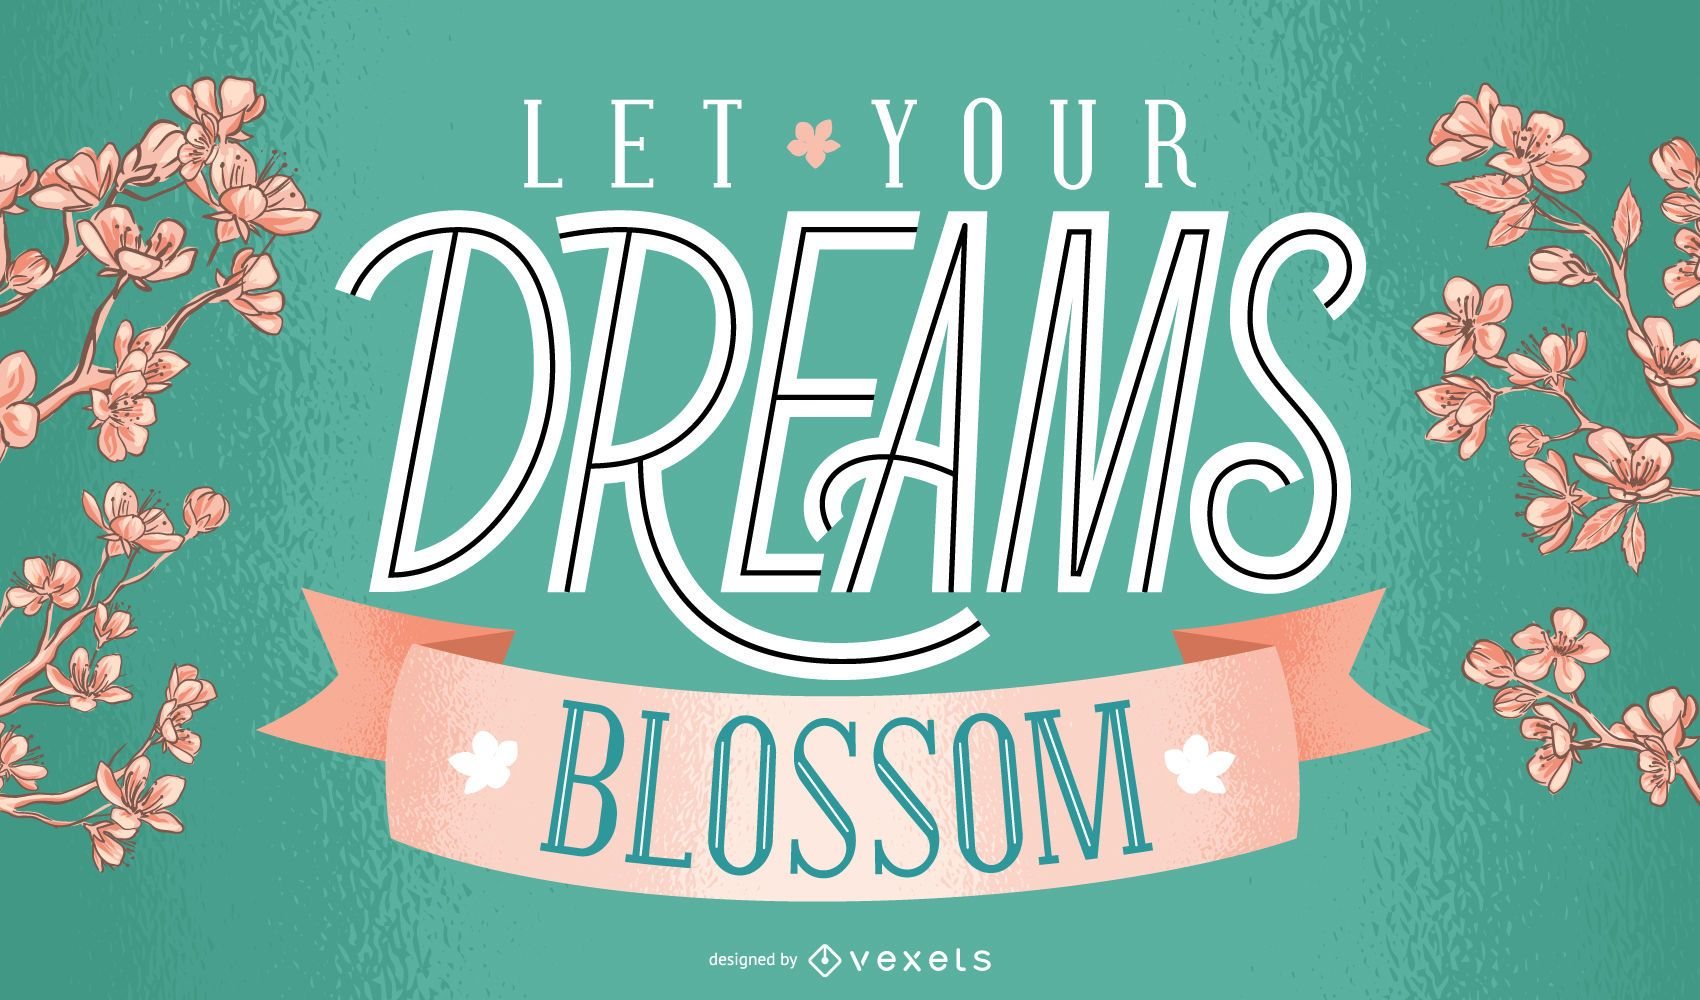 Spring dreams blossom lettering design